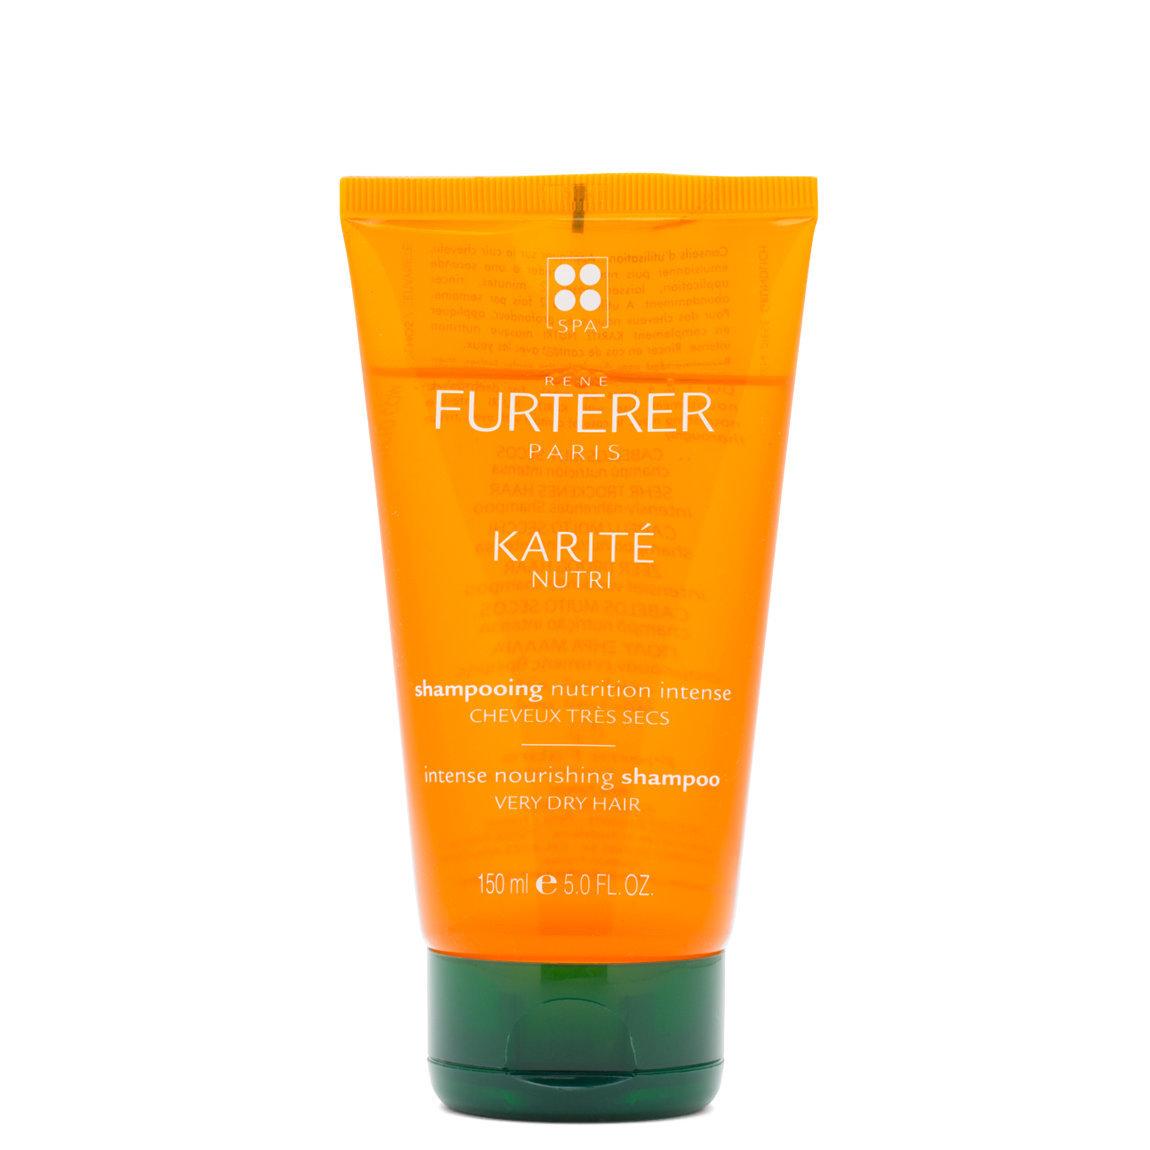 Rene Furterer Karite Nutri Intense Nourishing Shampoo product swatch.